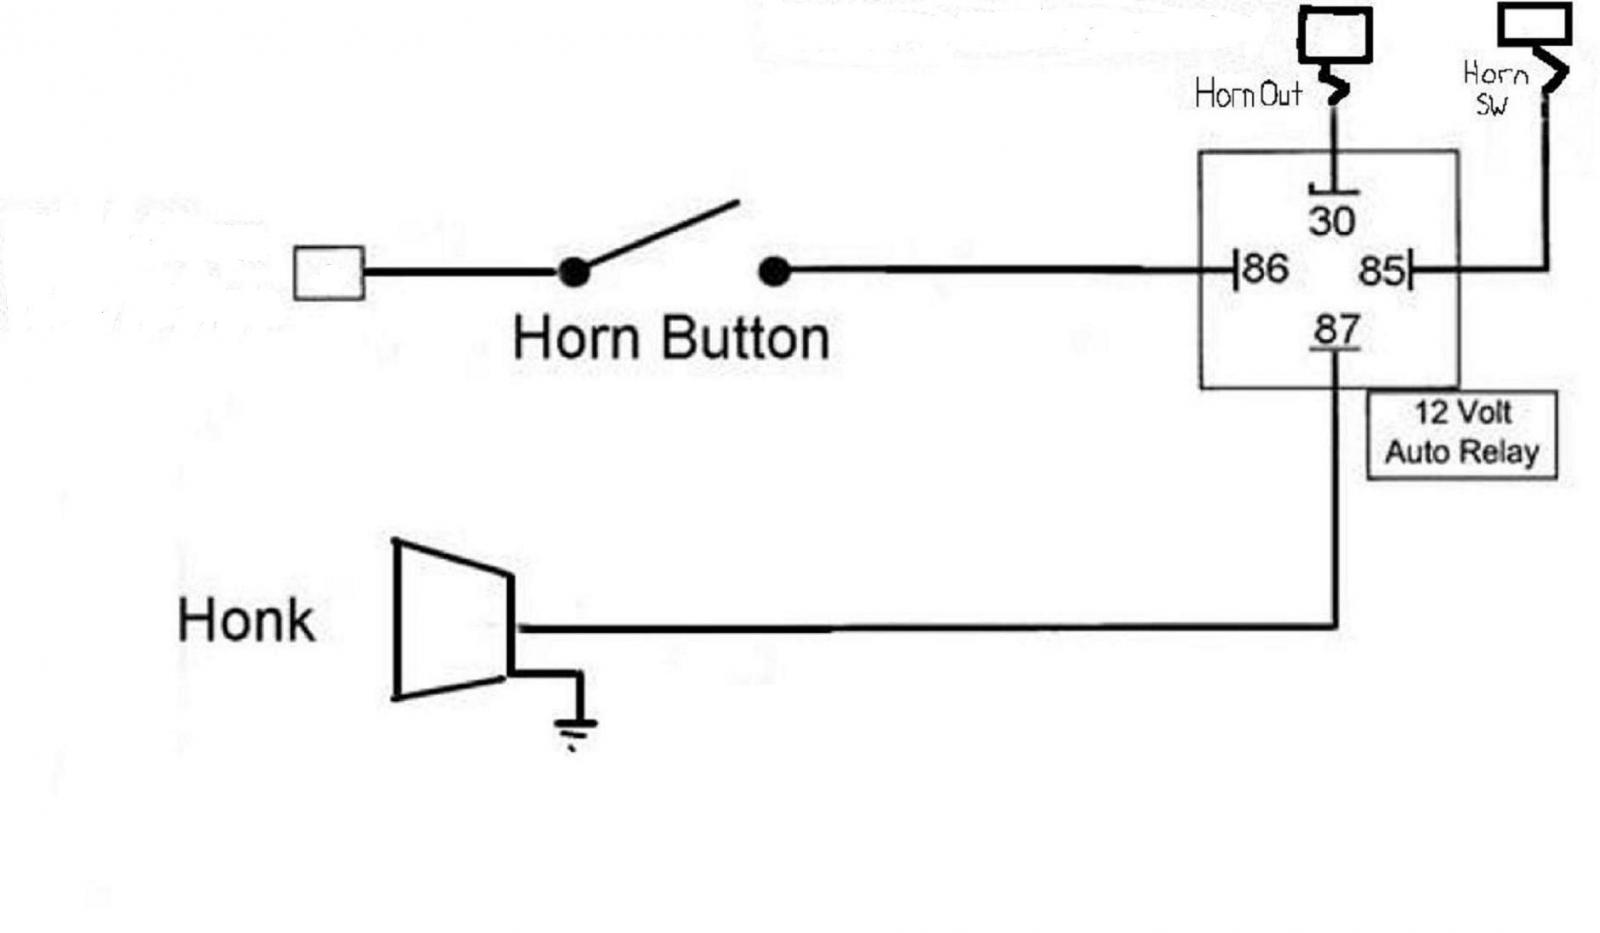 hight resolution of car horn schematic wiring diagram show gem car horn diagram